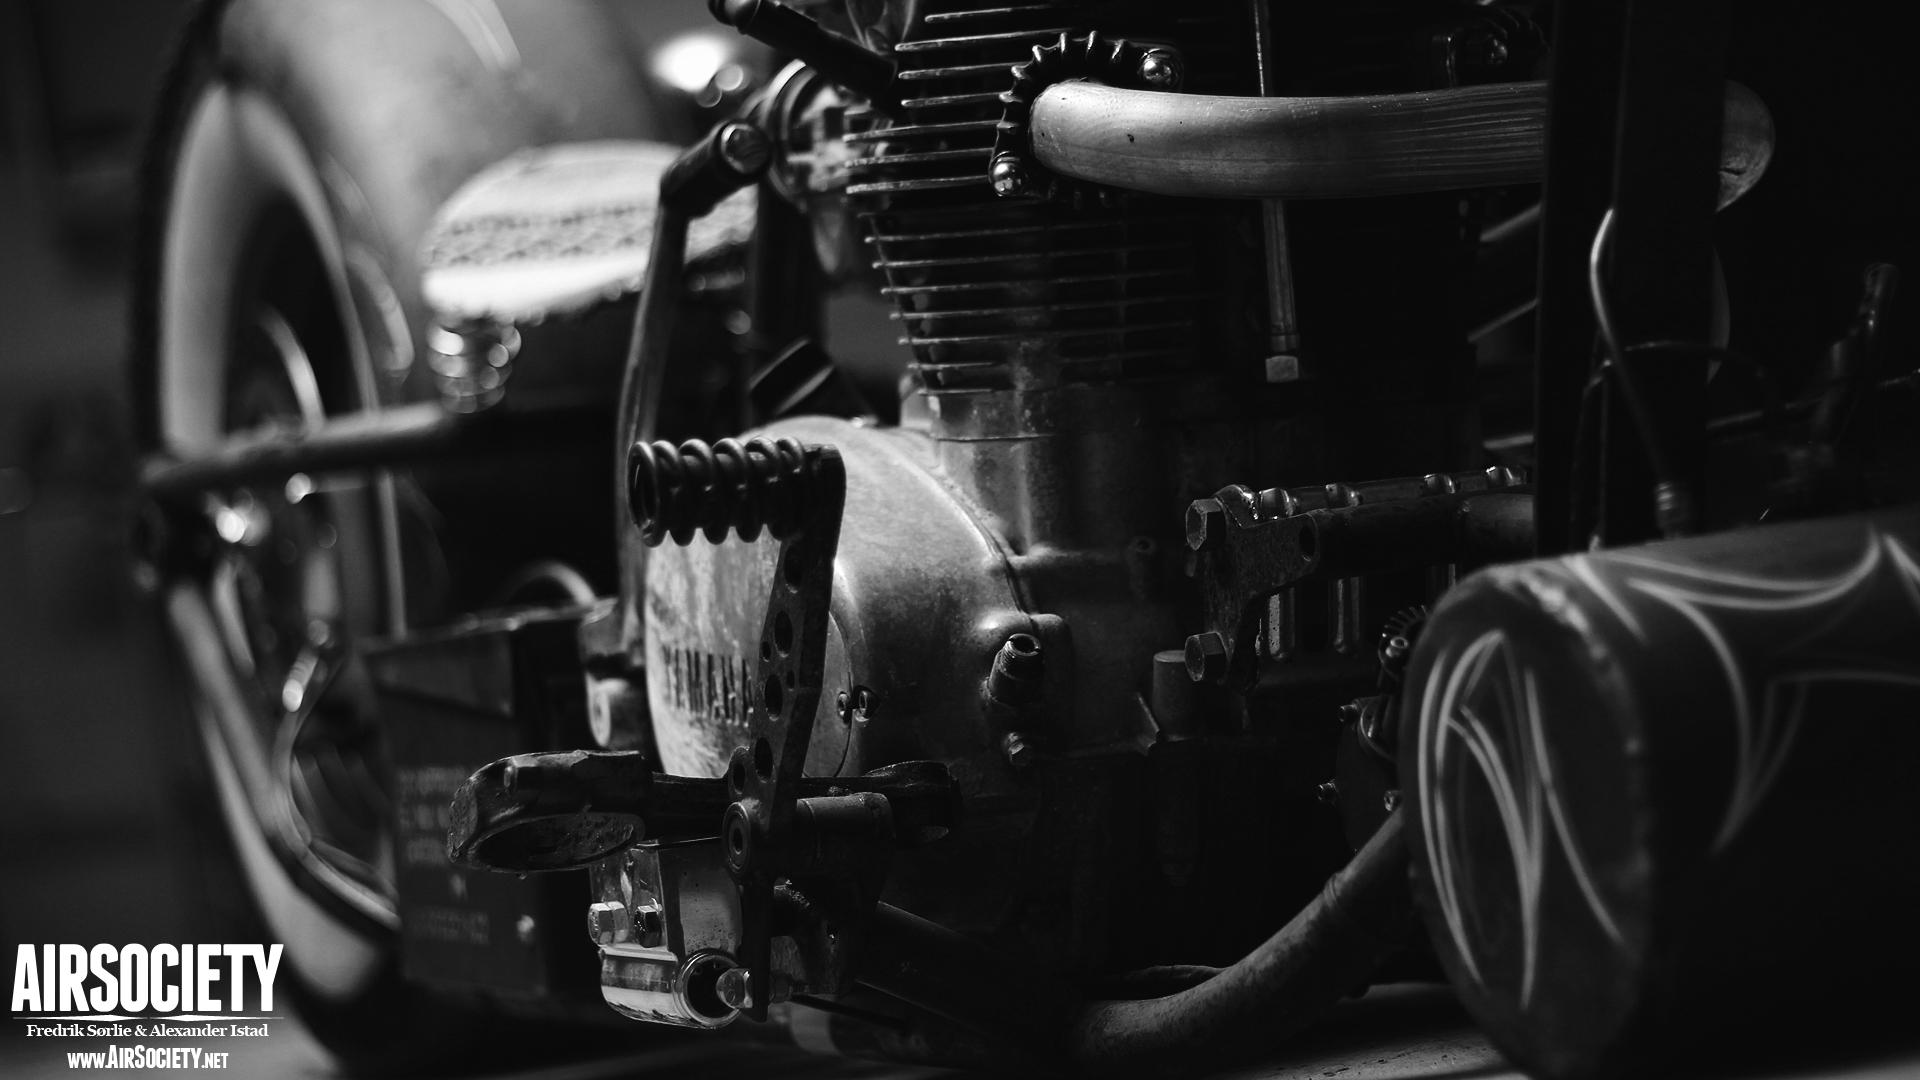 rat bike air ride suspension bagged rust motorcycle chopper yamaha 1920x1080